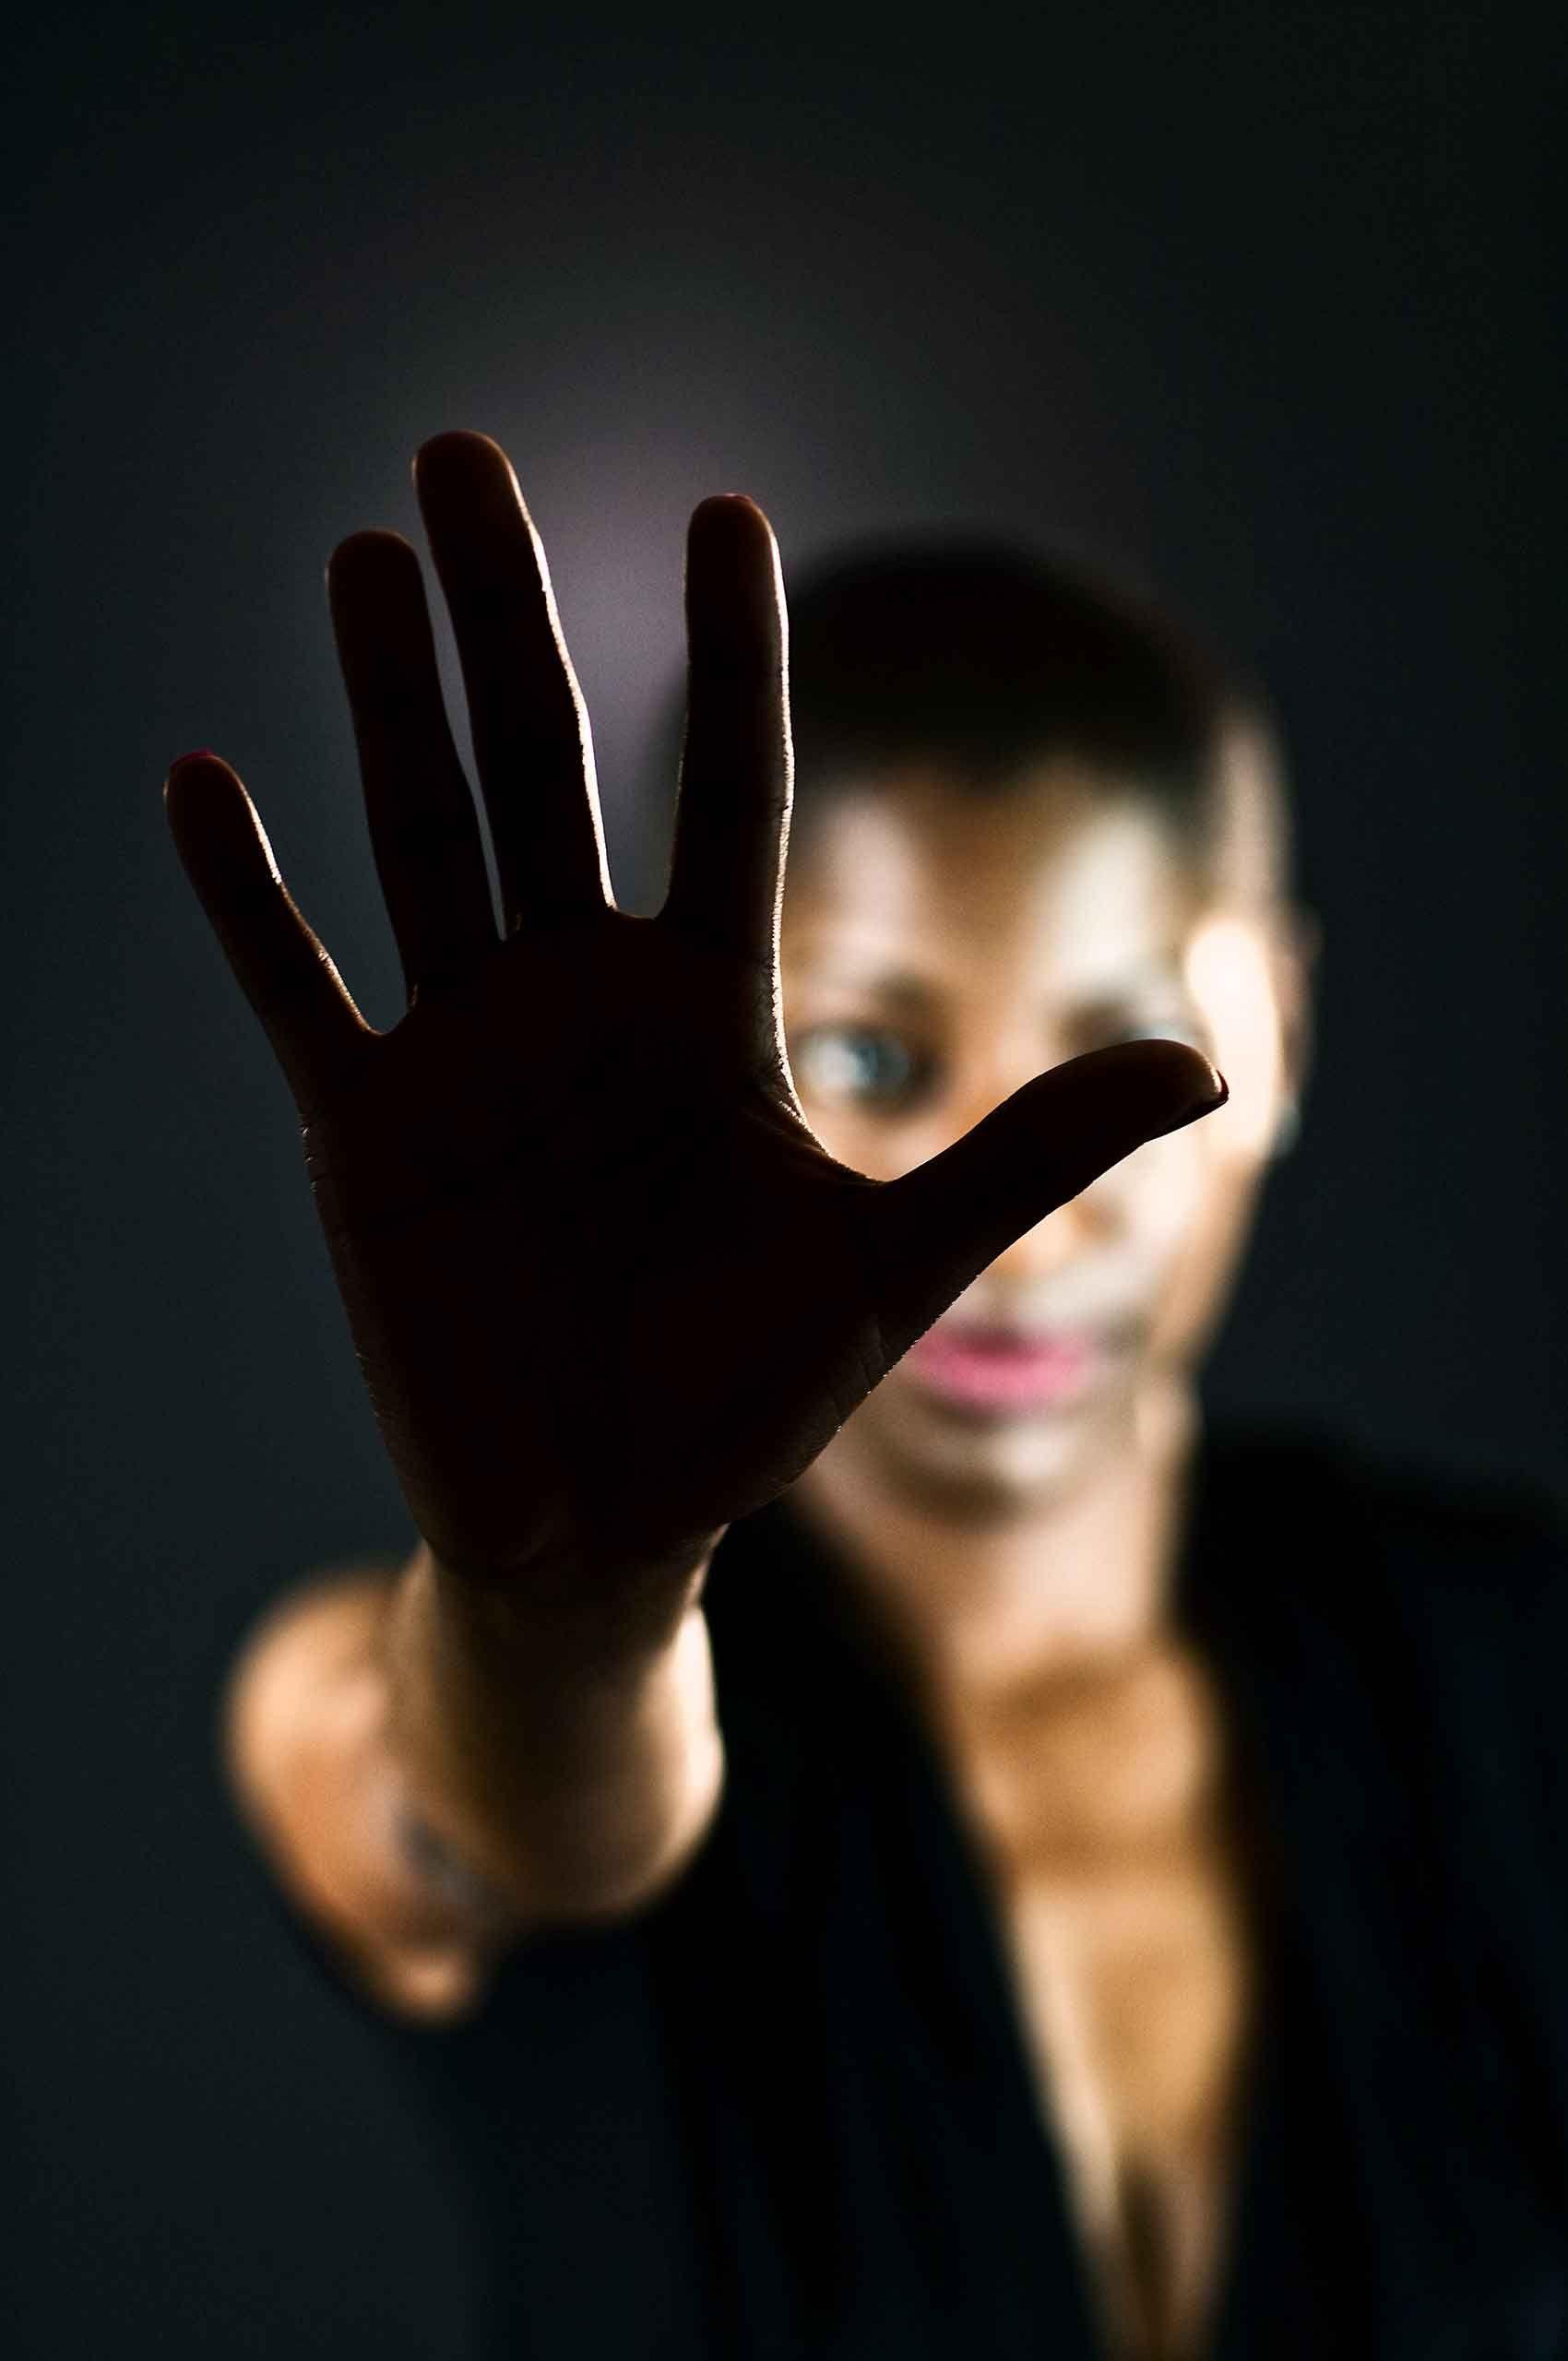 Hand-africanamericanwoman-by-HenrikOlundPhotography.jpg